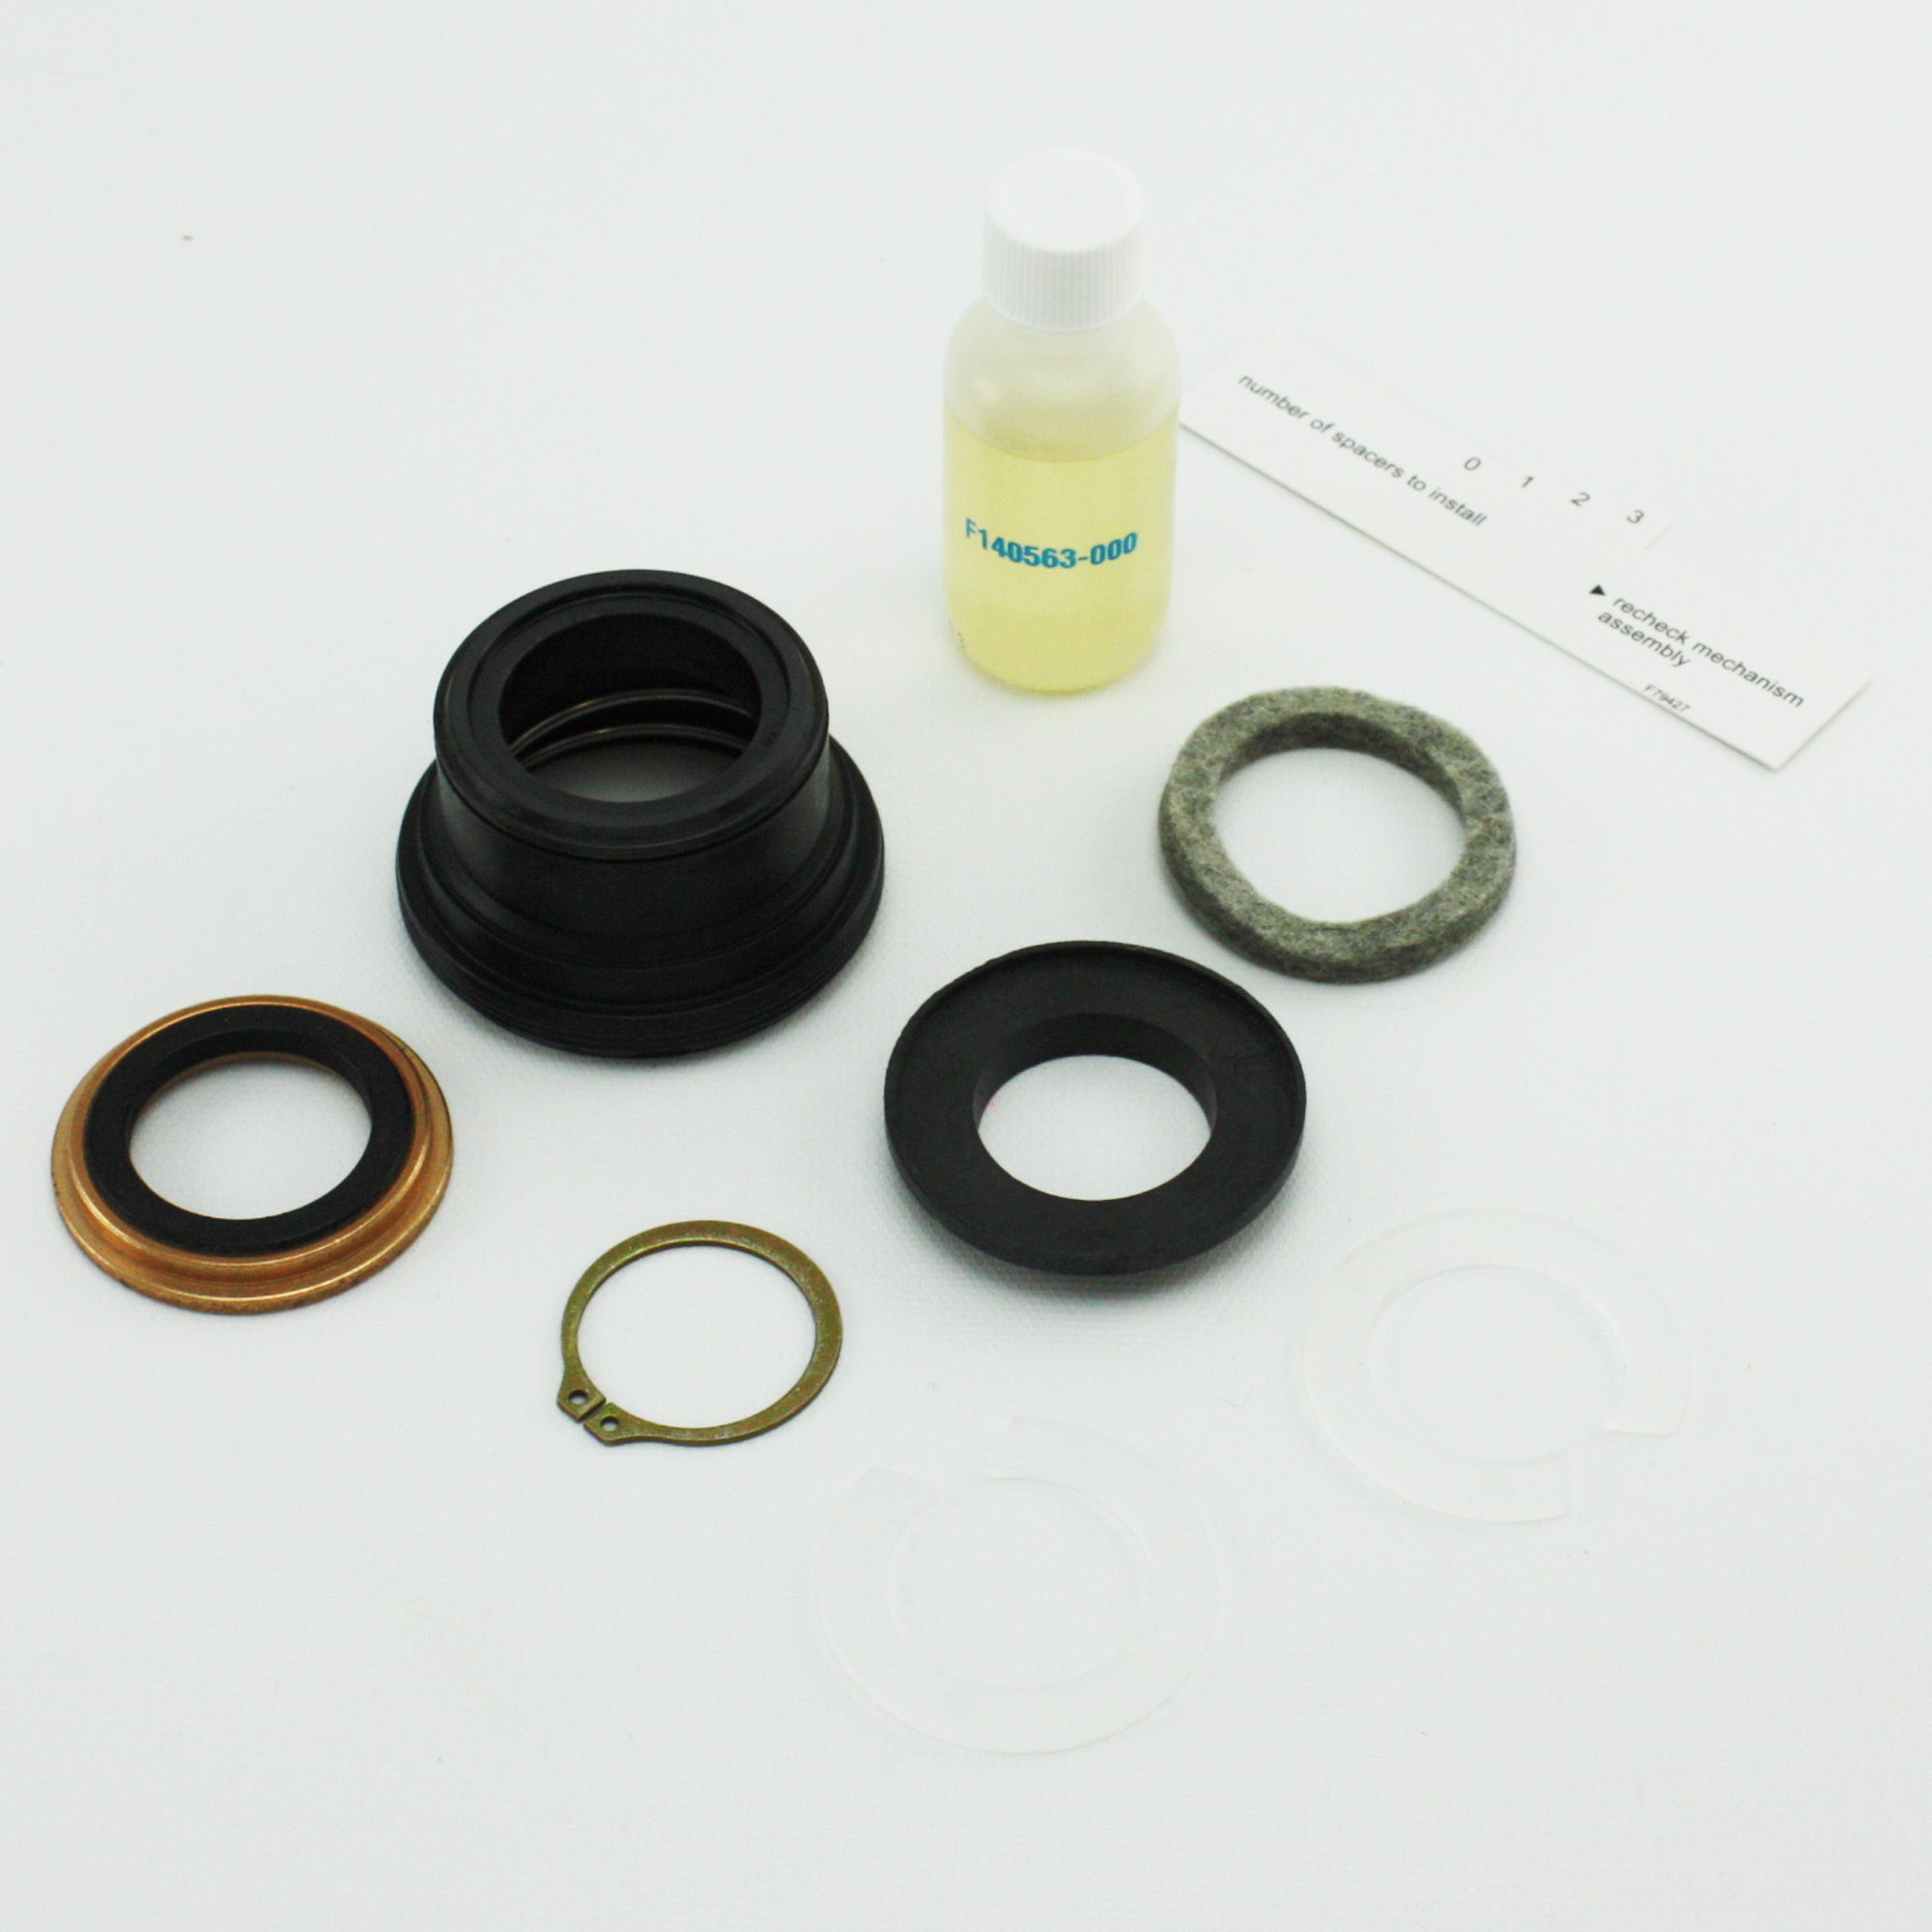 5308950197 Frigidaire Washing Machine Tub Seal